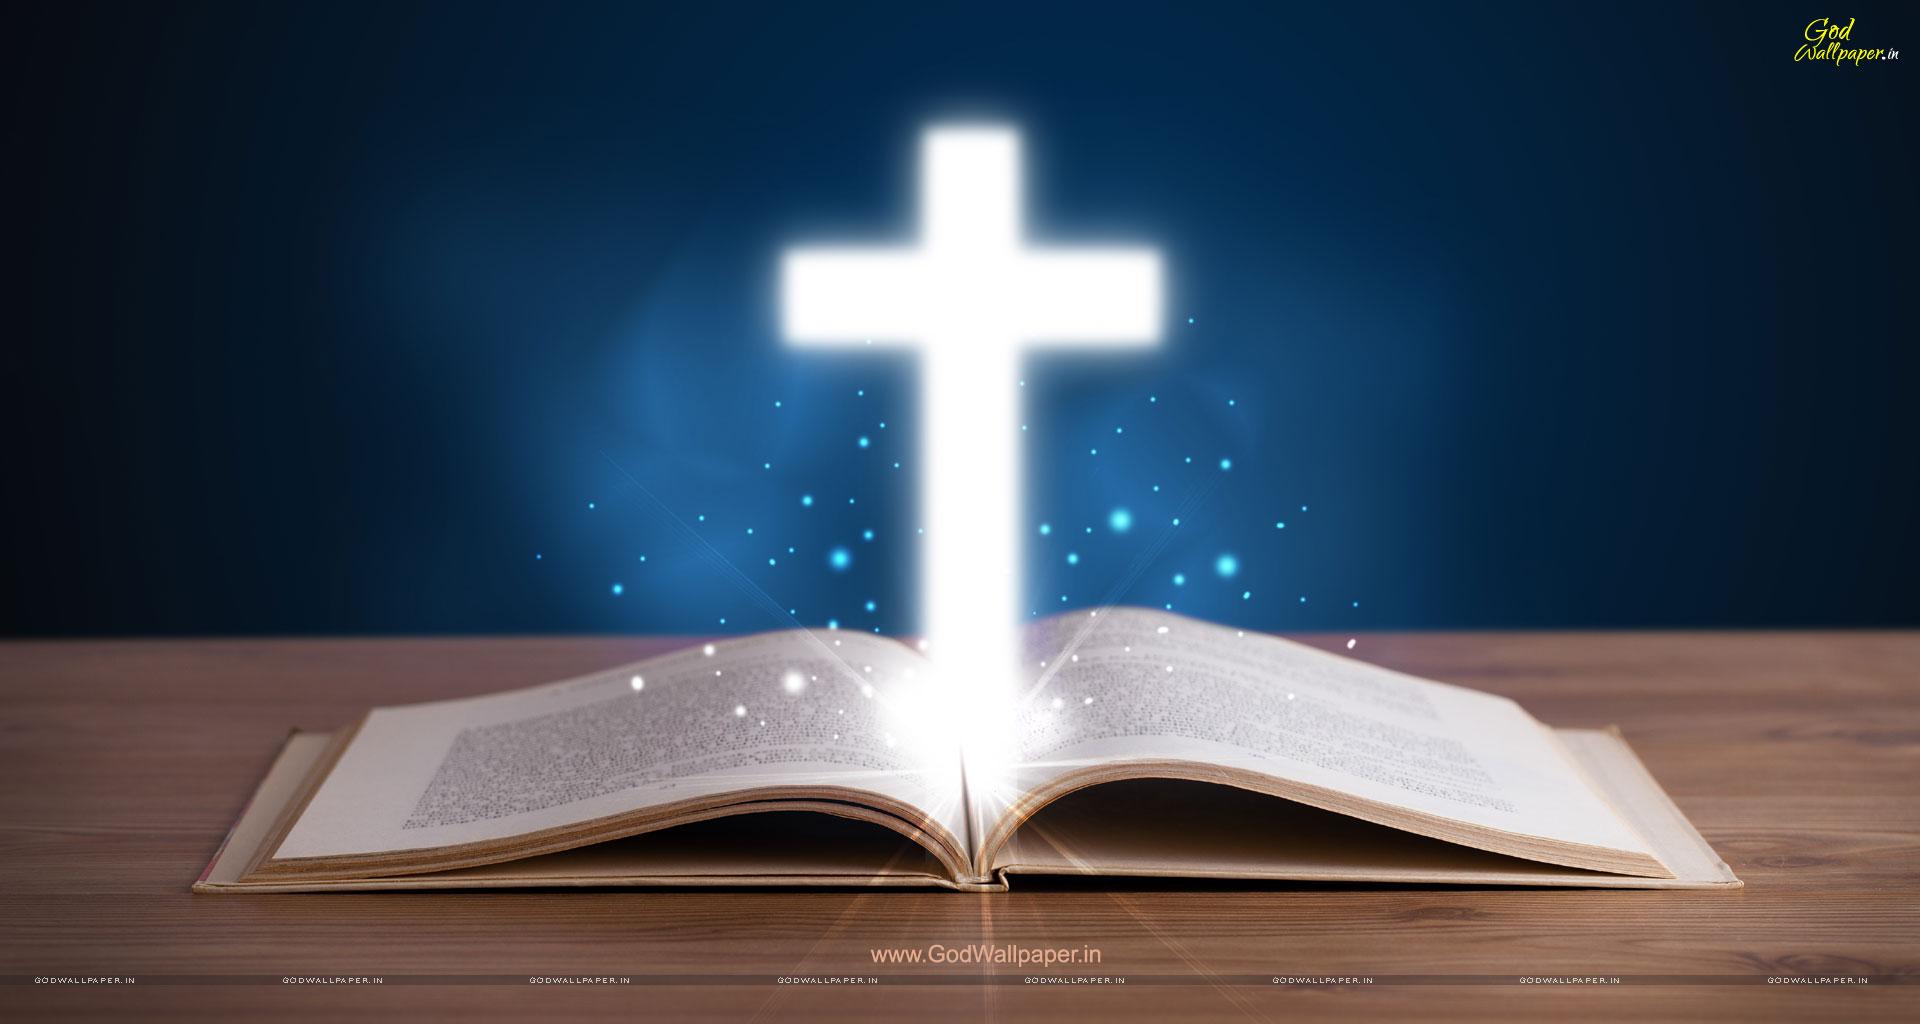 Jesus cross hd wallpaper widescreen high definition how to set wallpaper on your desktop voltagebd Choice Image